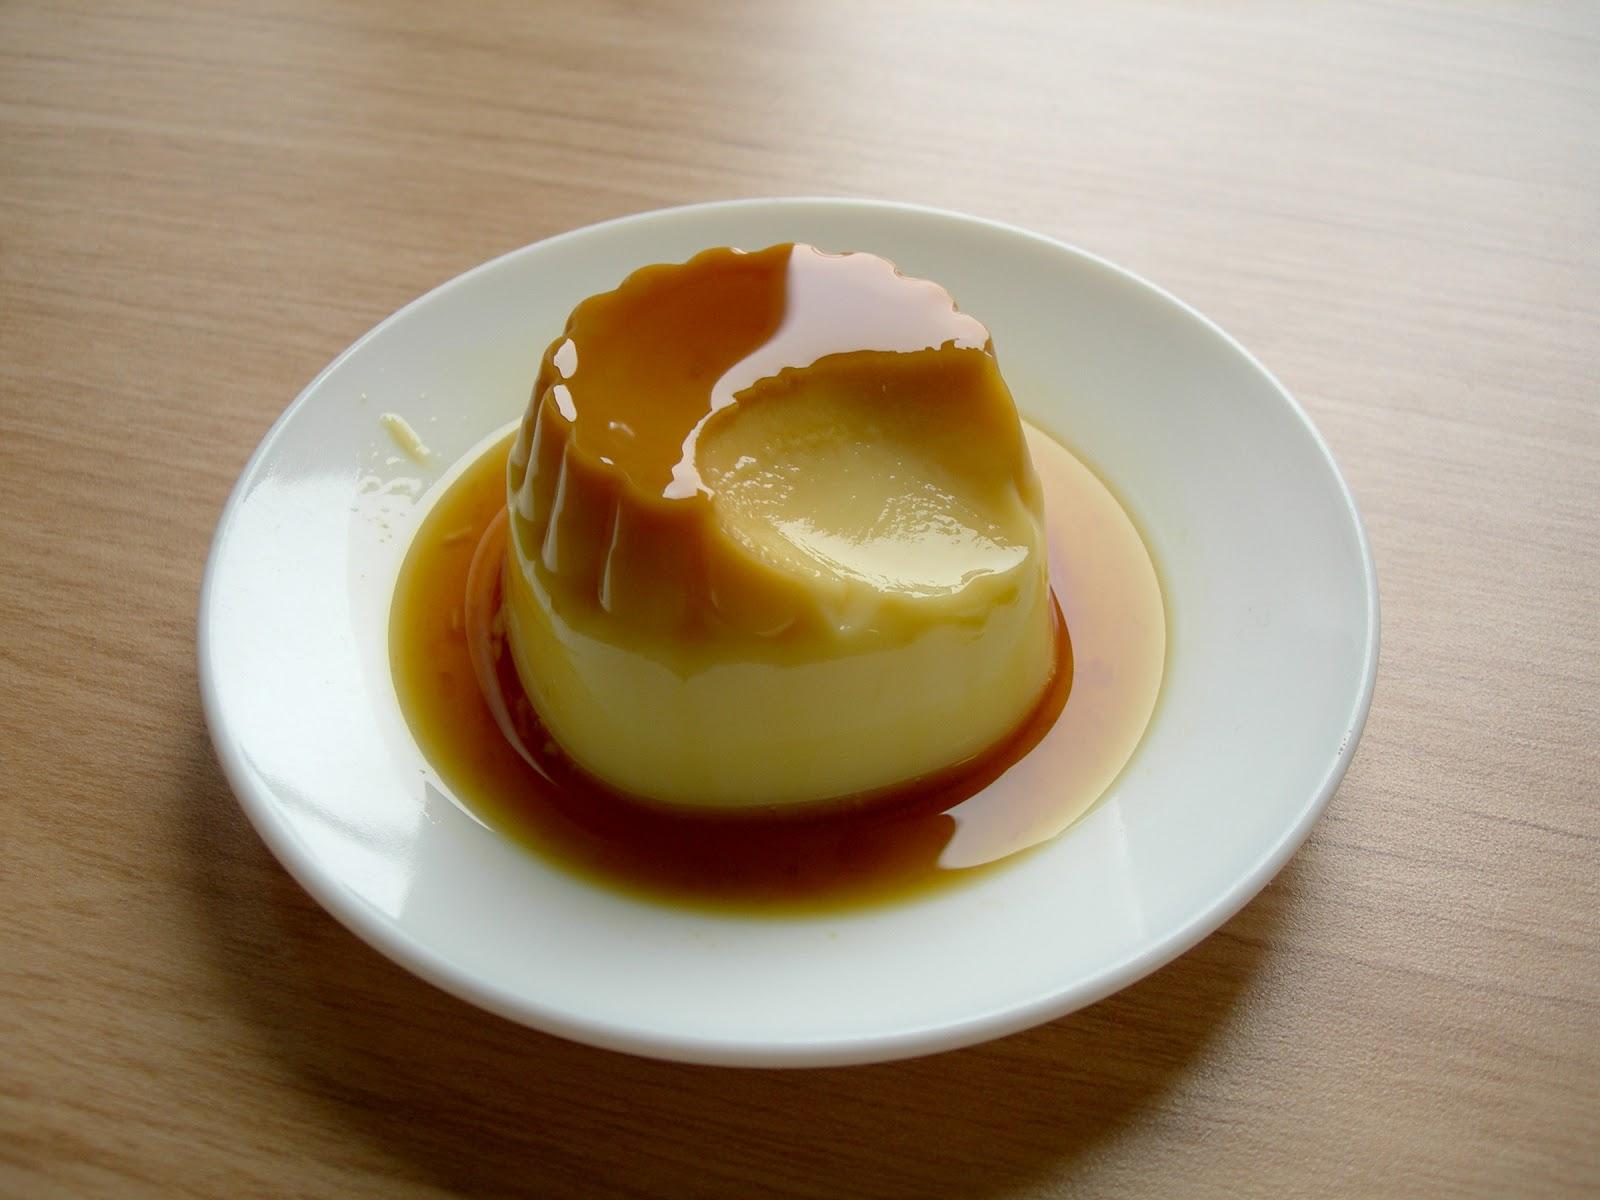 Monday's Menu: Spectacular Spanish Desserts | Down The ...